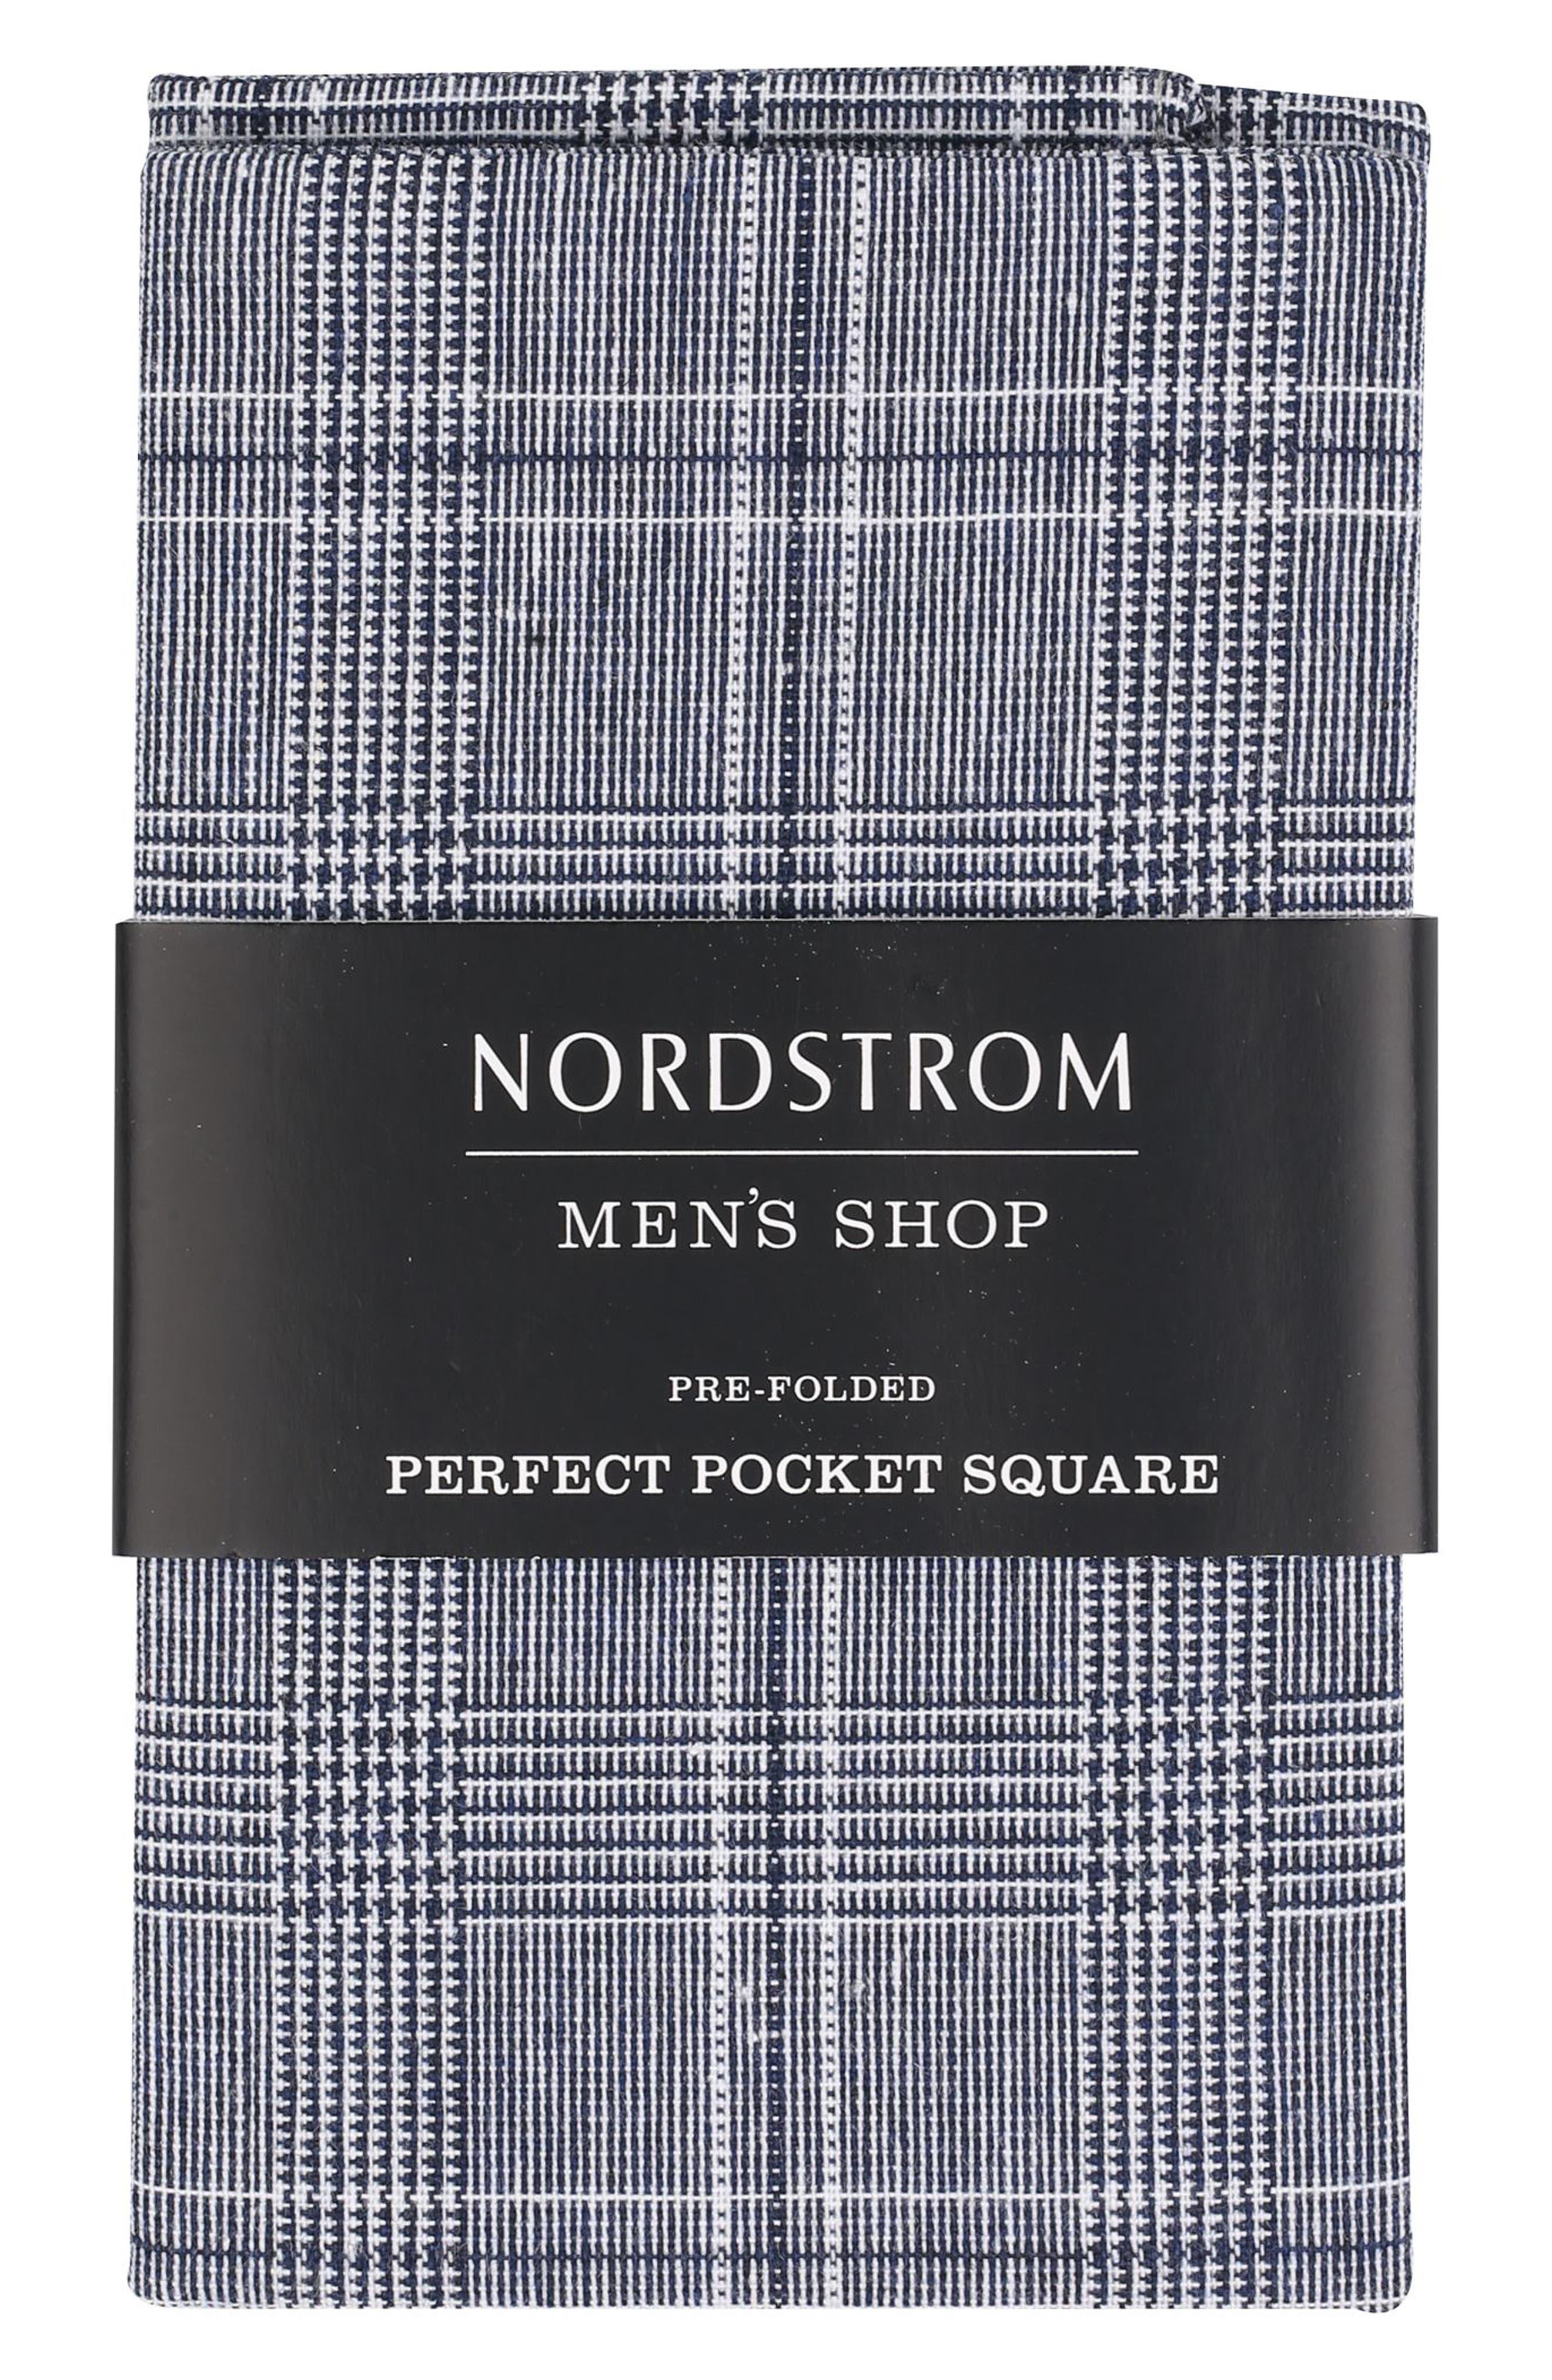 Alternate Image 1 Selected - Nordstrom Men's Shop The Perfect Pocket Square